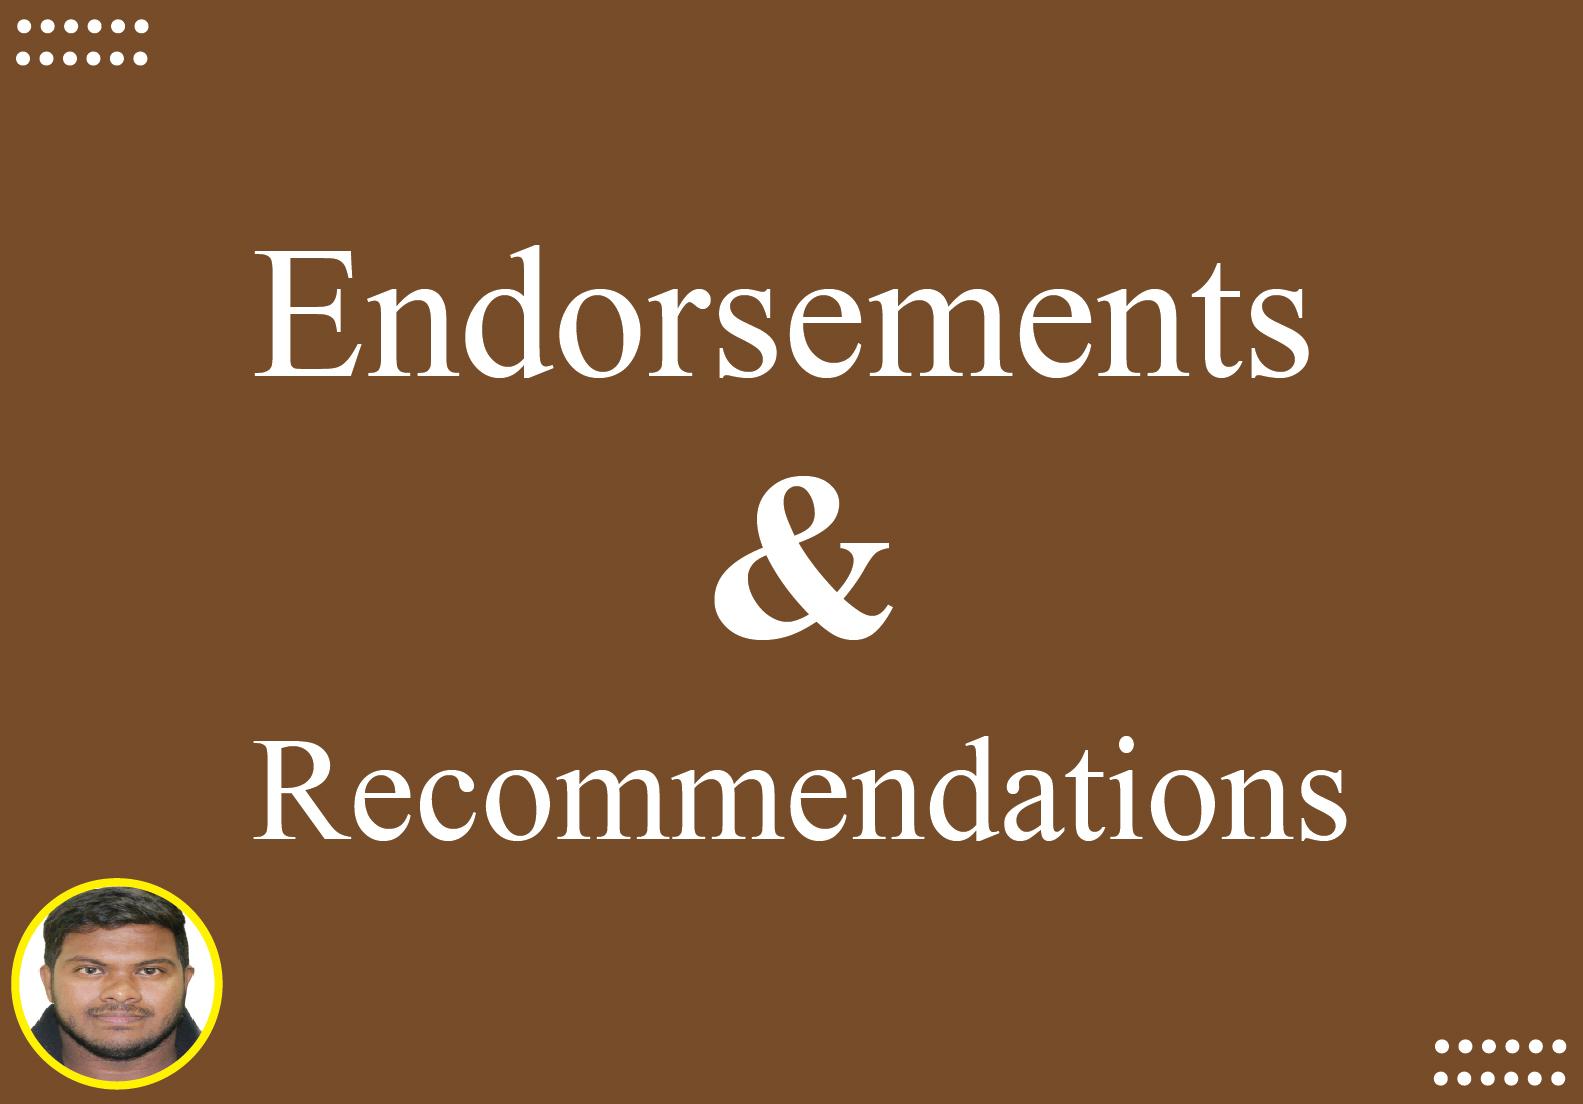 I will Endorse 5 Skills on LinkedIn